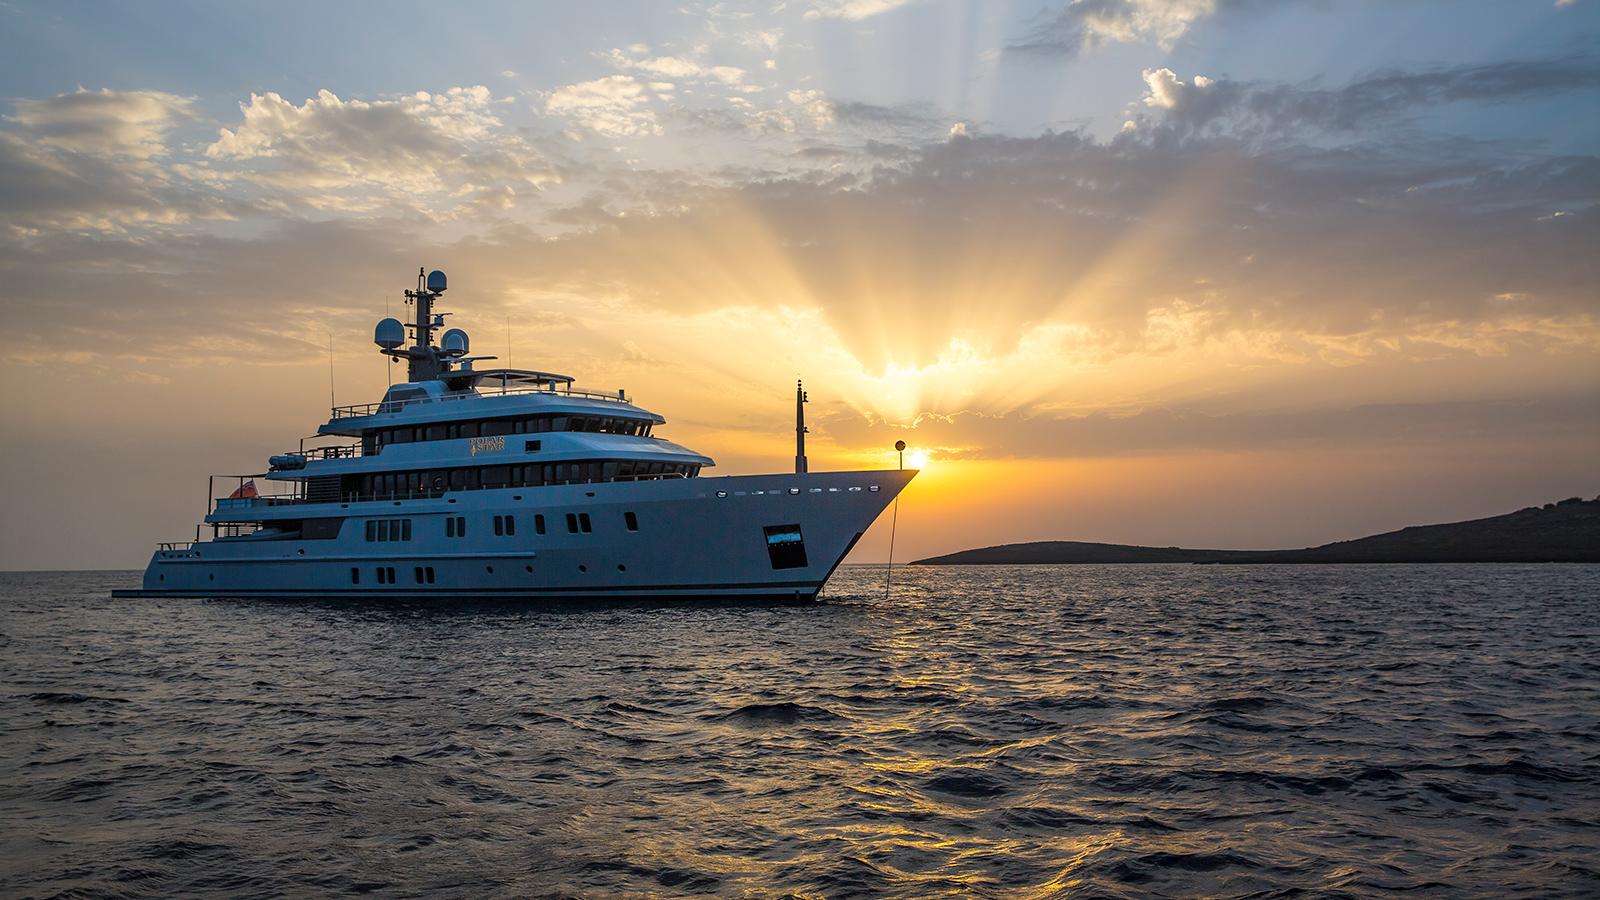 sunset-view-of-the-lurssen-superyacht-polar-star